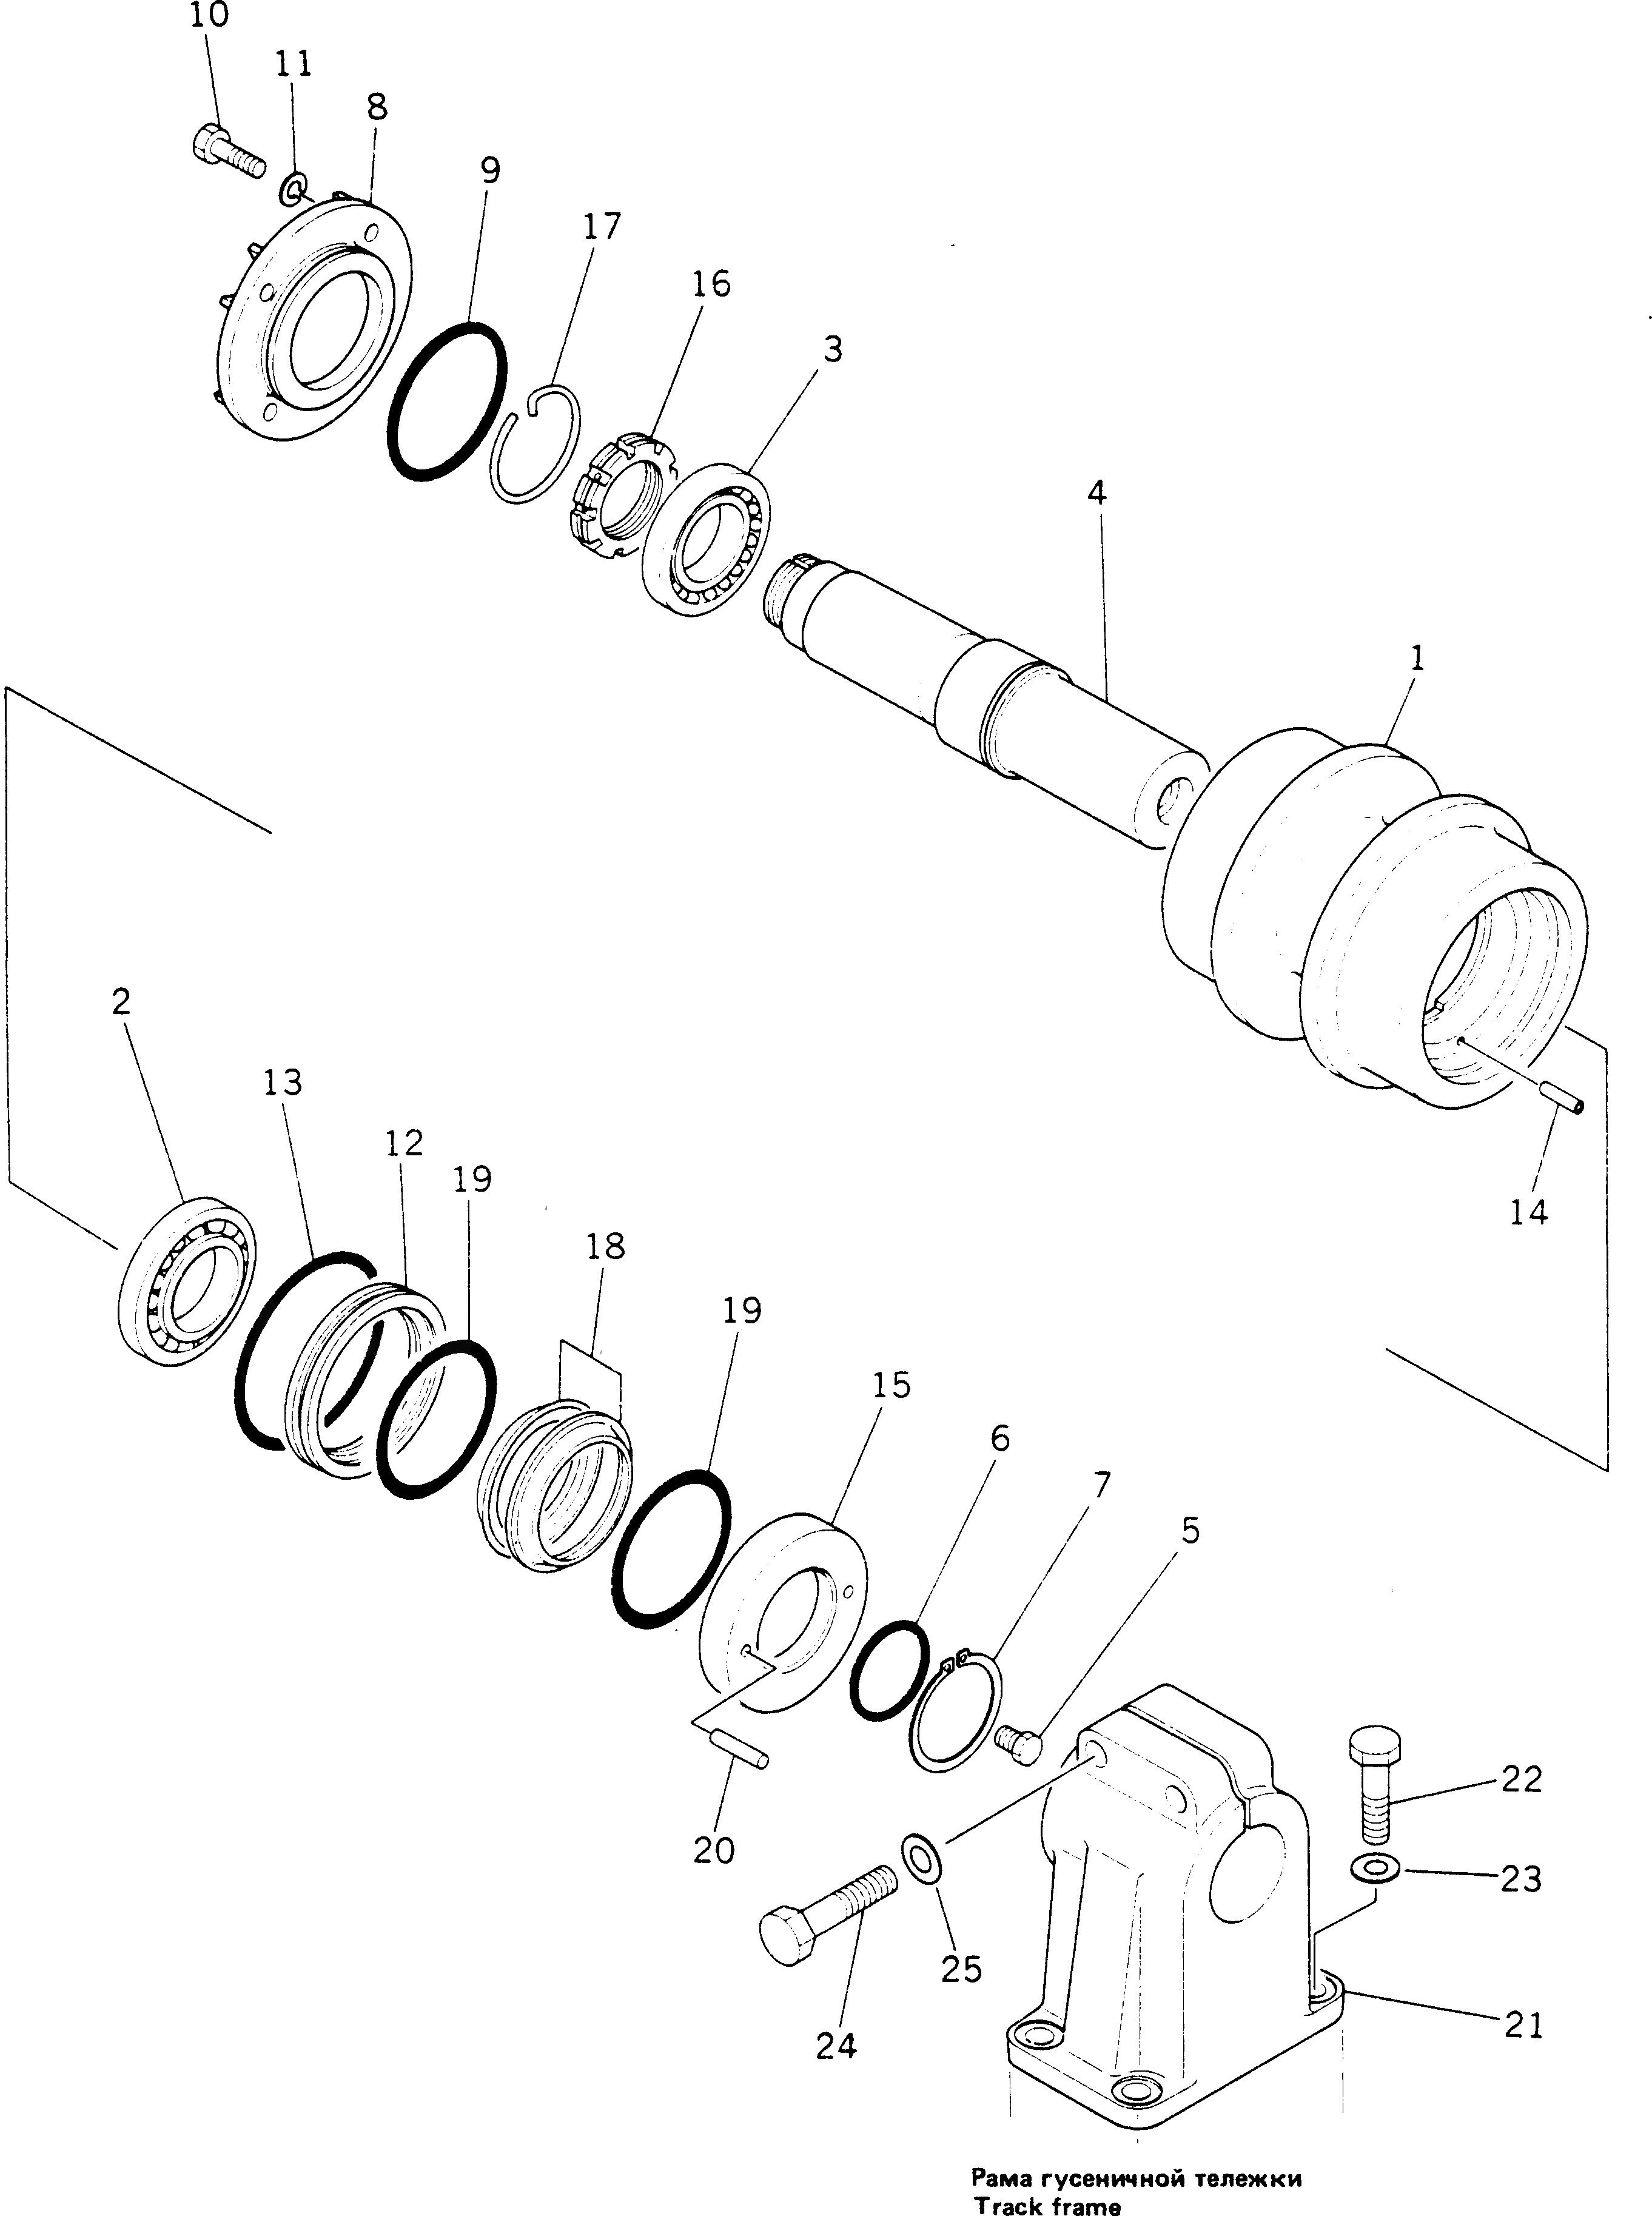 c36 wiring diagram repair machine Outlet Wiring Diagram